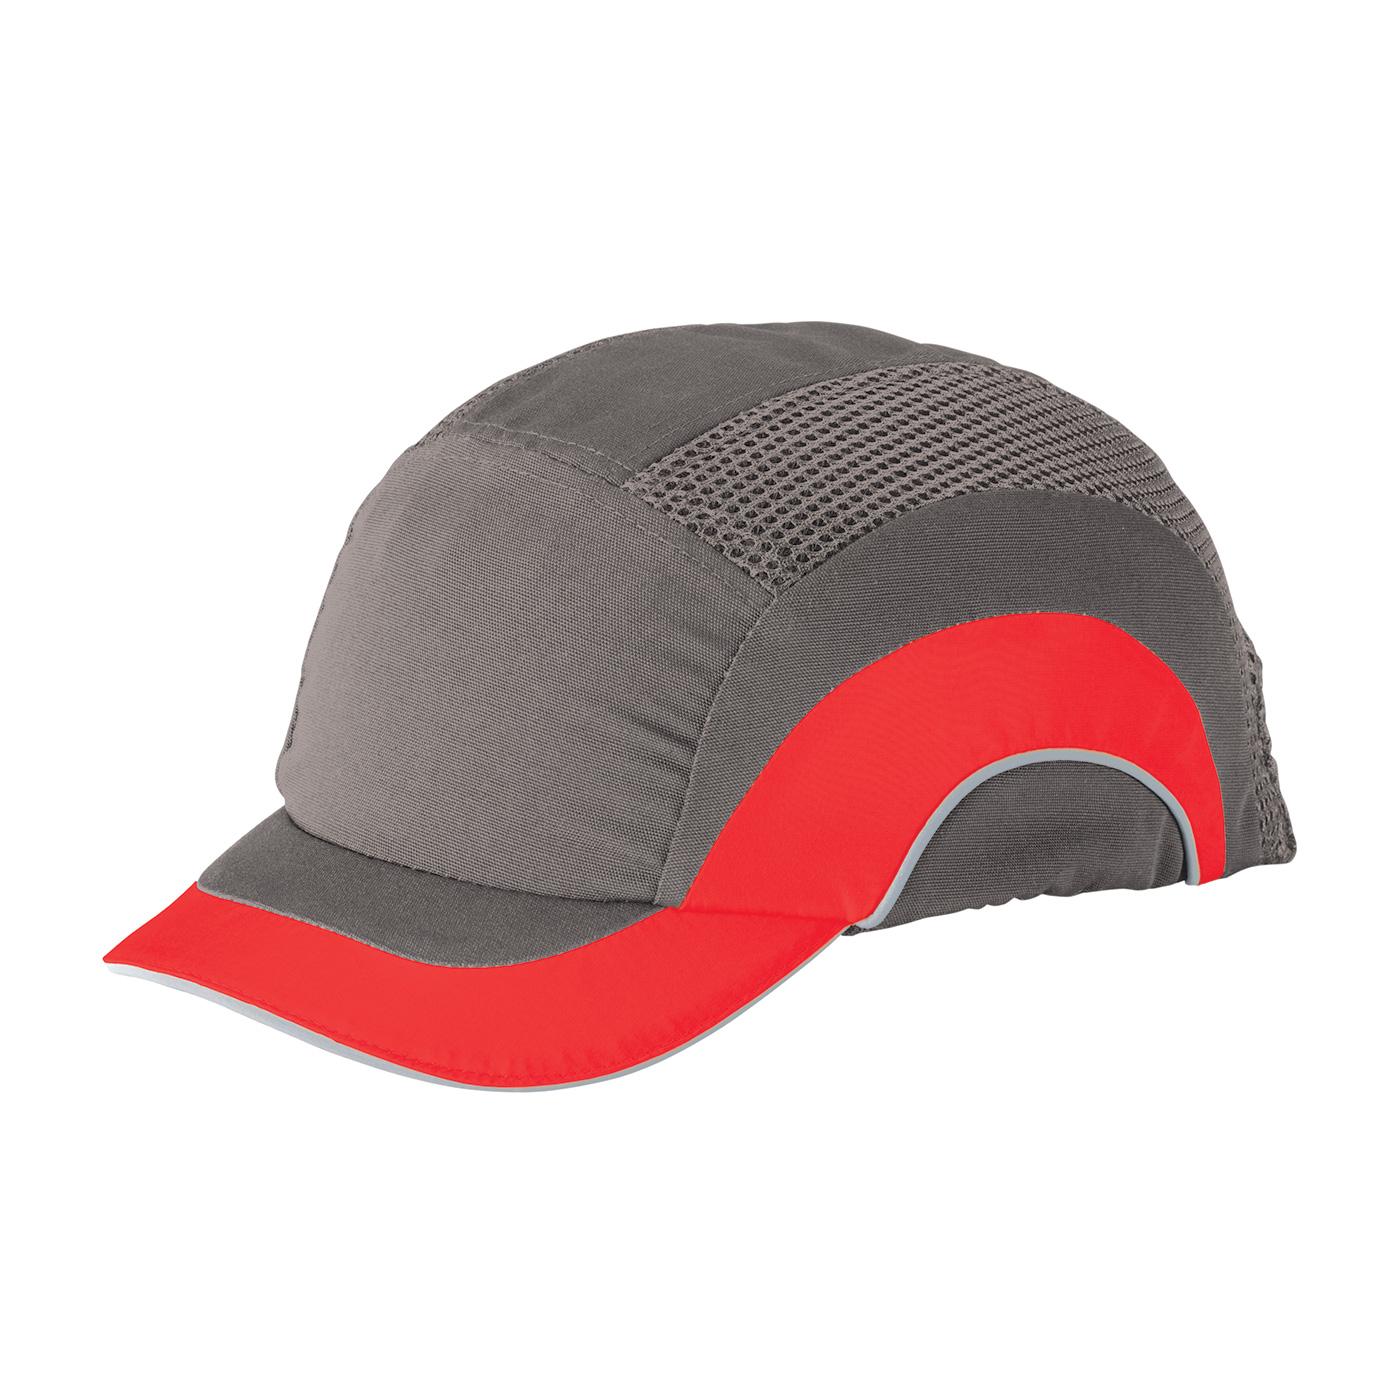 A1 Low Profile Short Brim Baseball Bump Cap Short Brim